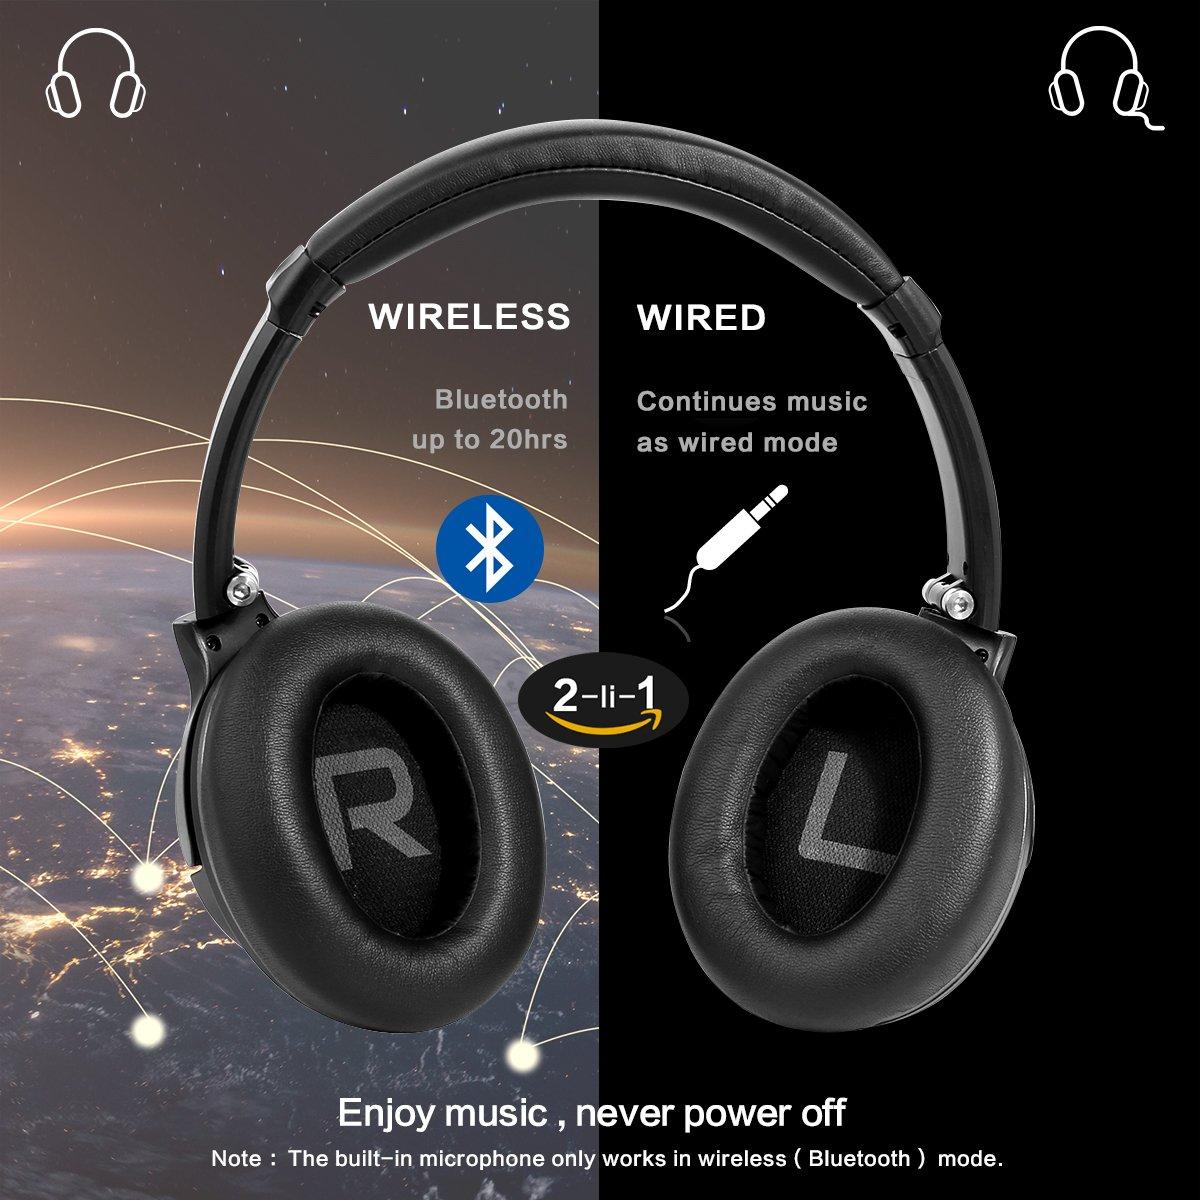 JIUHUFH - Auriculares inalámbricos Bluetooth 4.1 con micrófono para teléfono Celular, TV y PC: Amazon.es: Electrónica